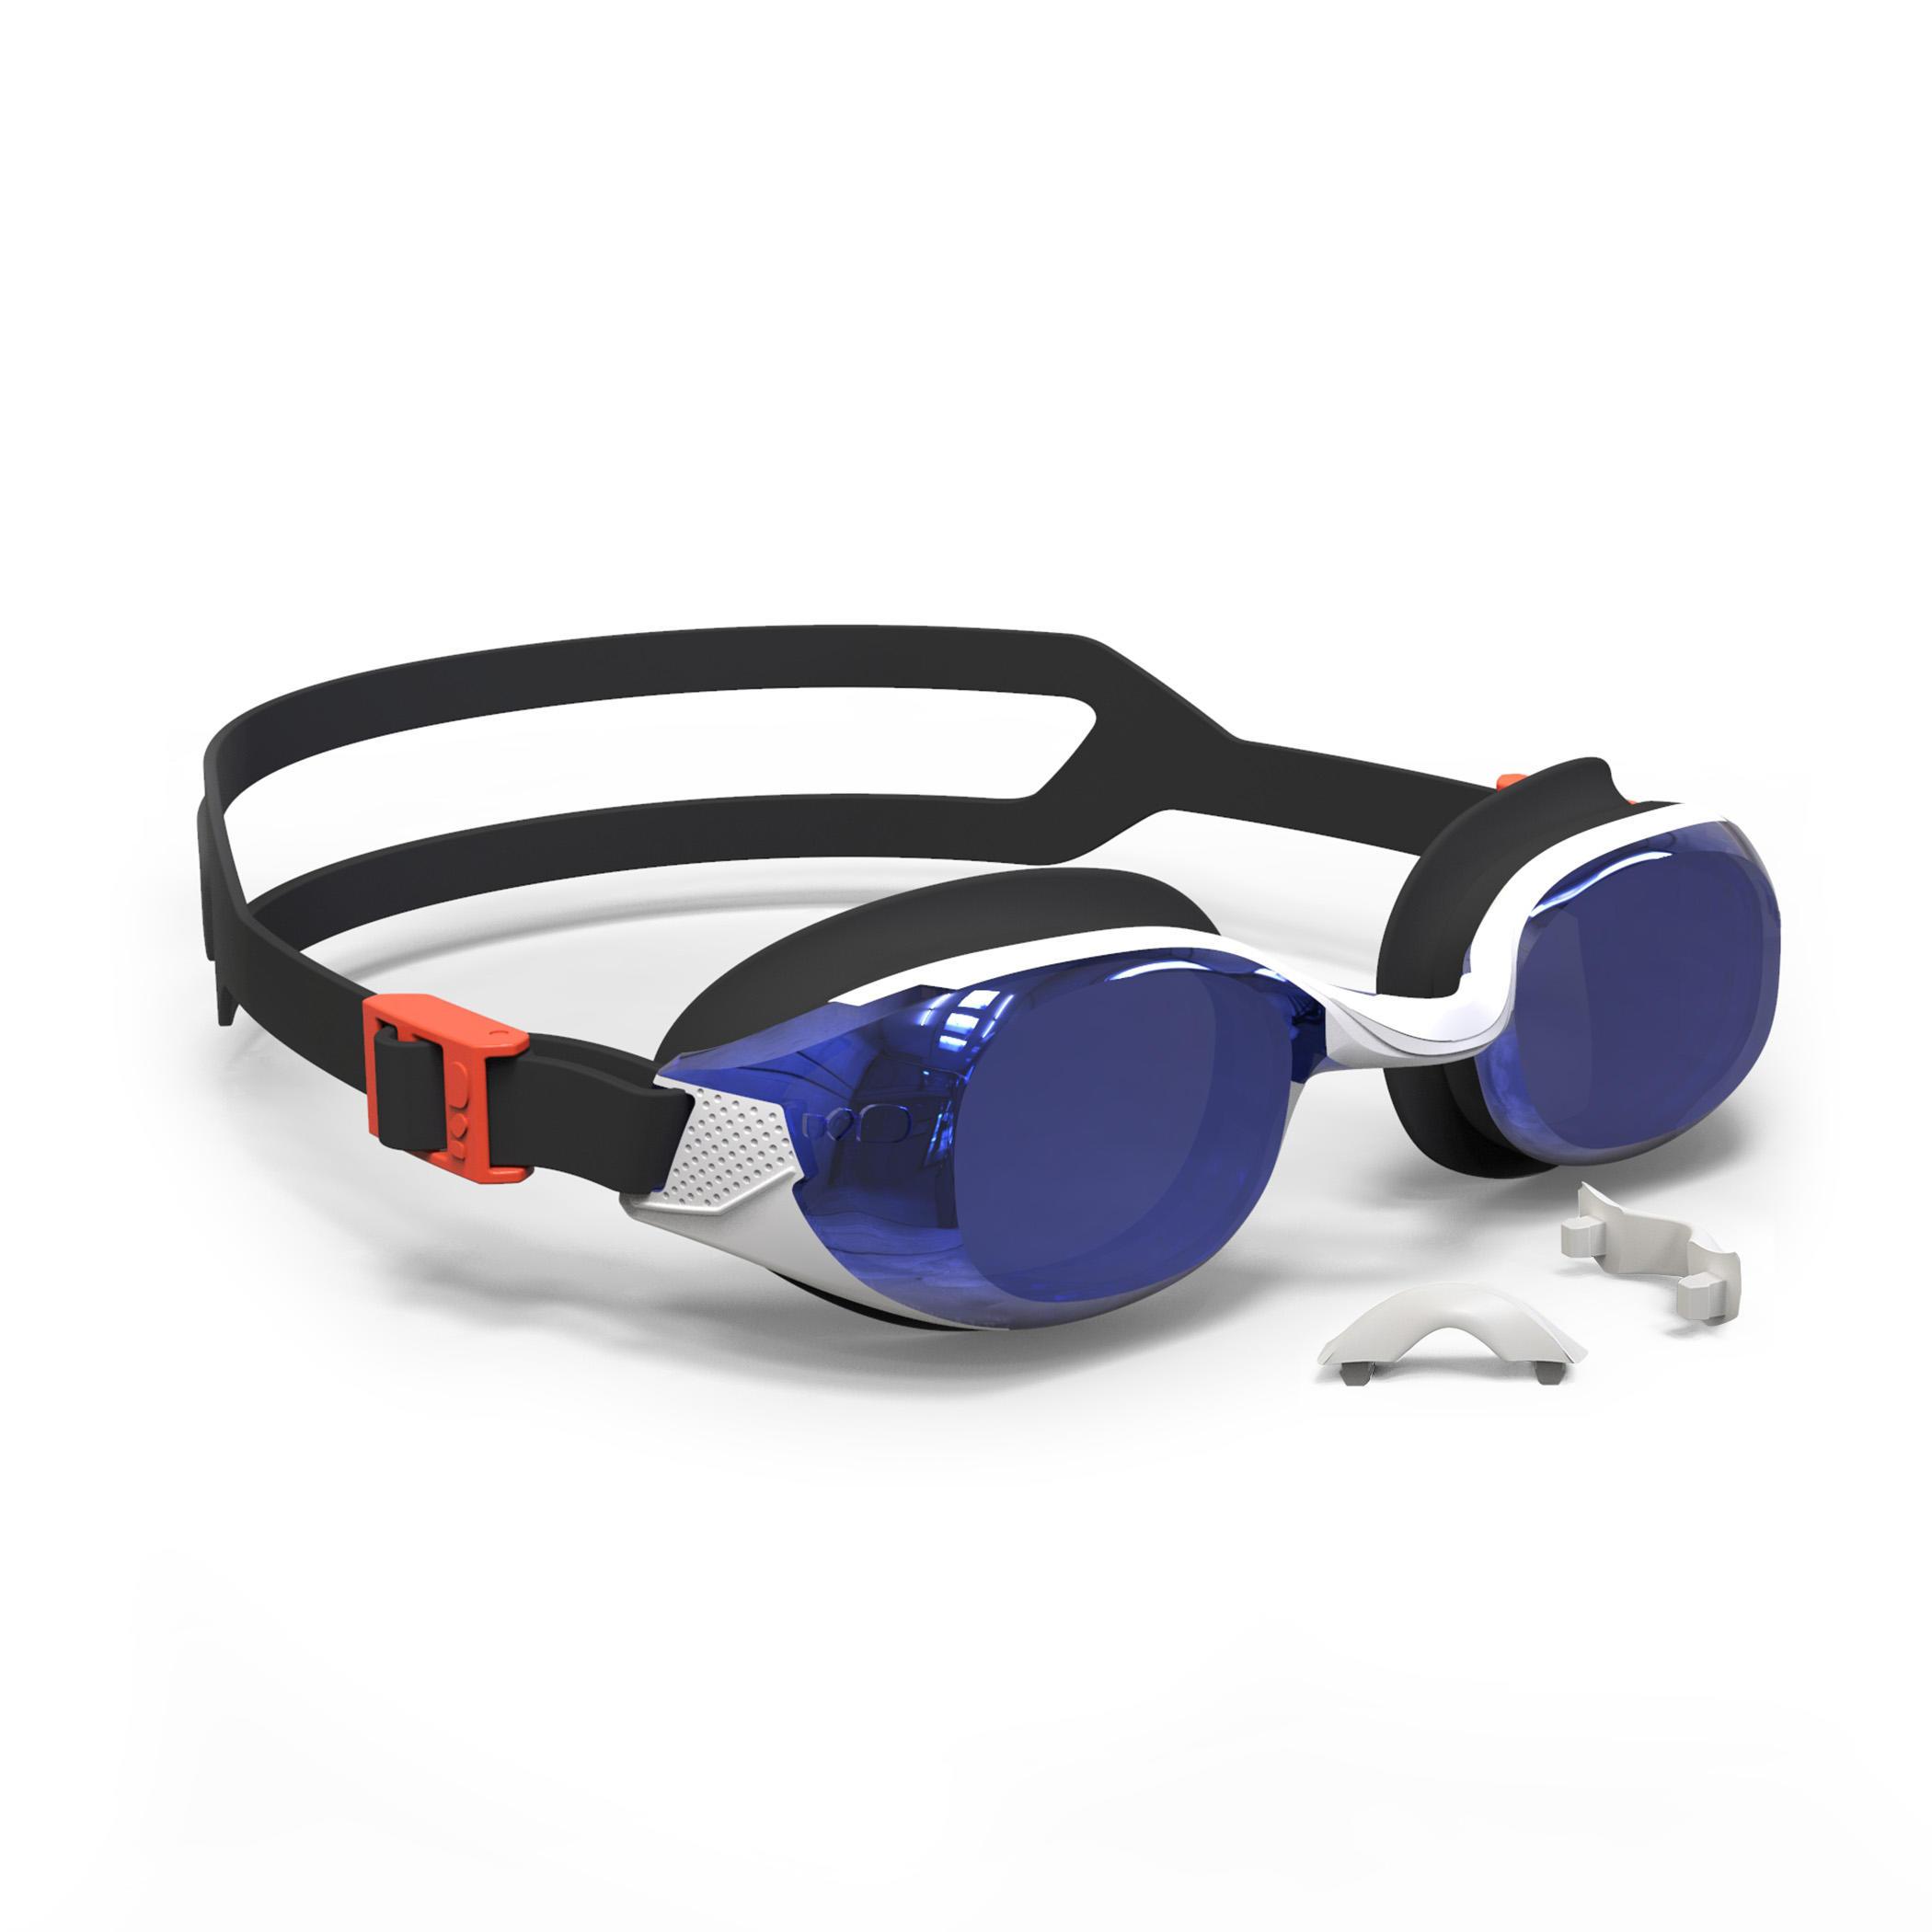 61ae7342d74216 Zwembril kopen?   Decathlon.nl